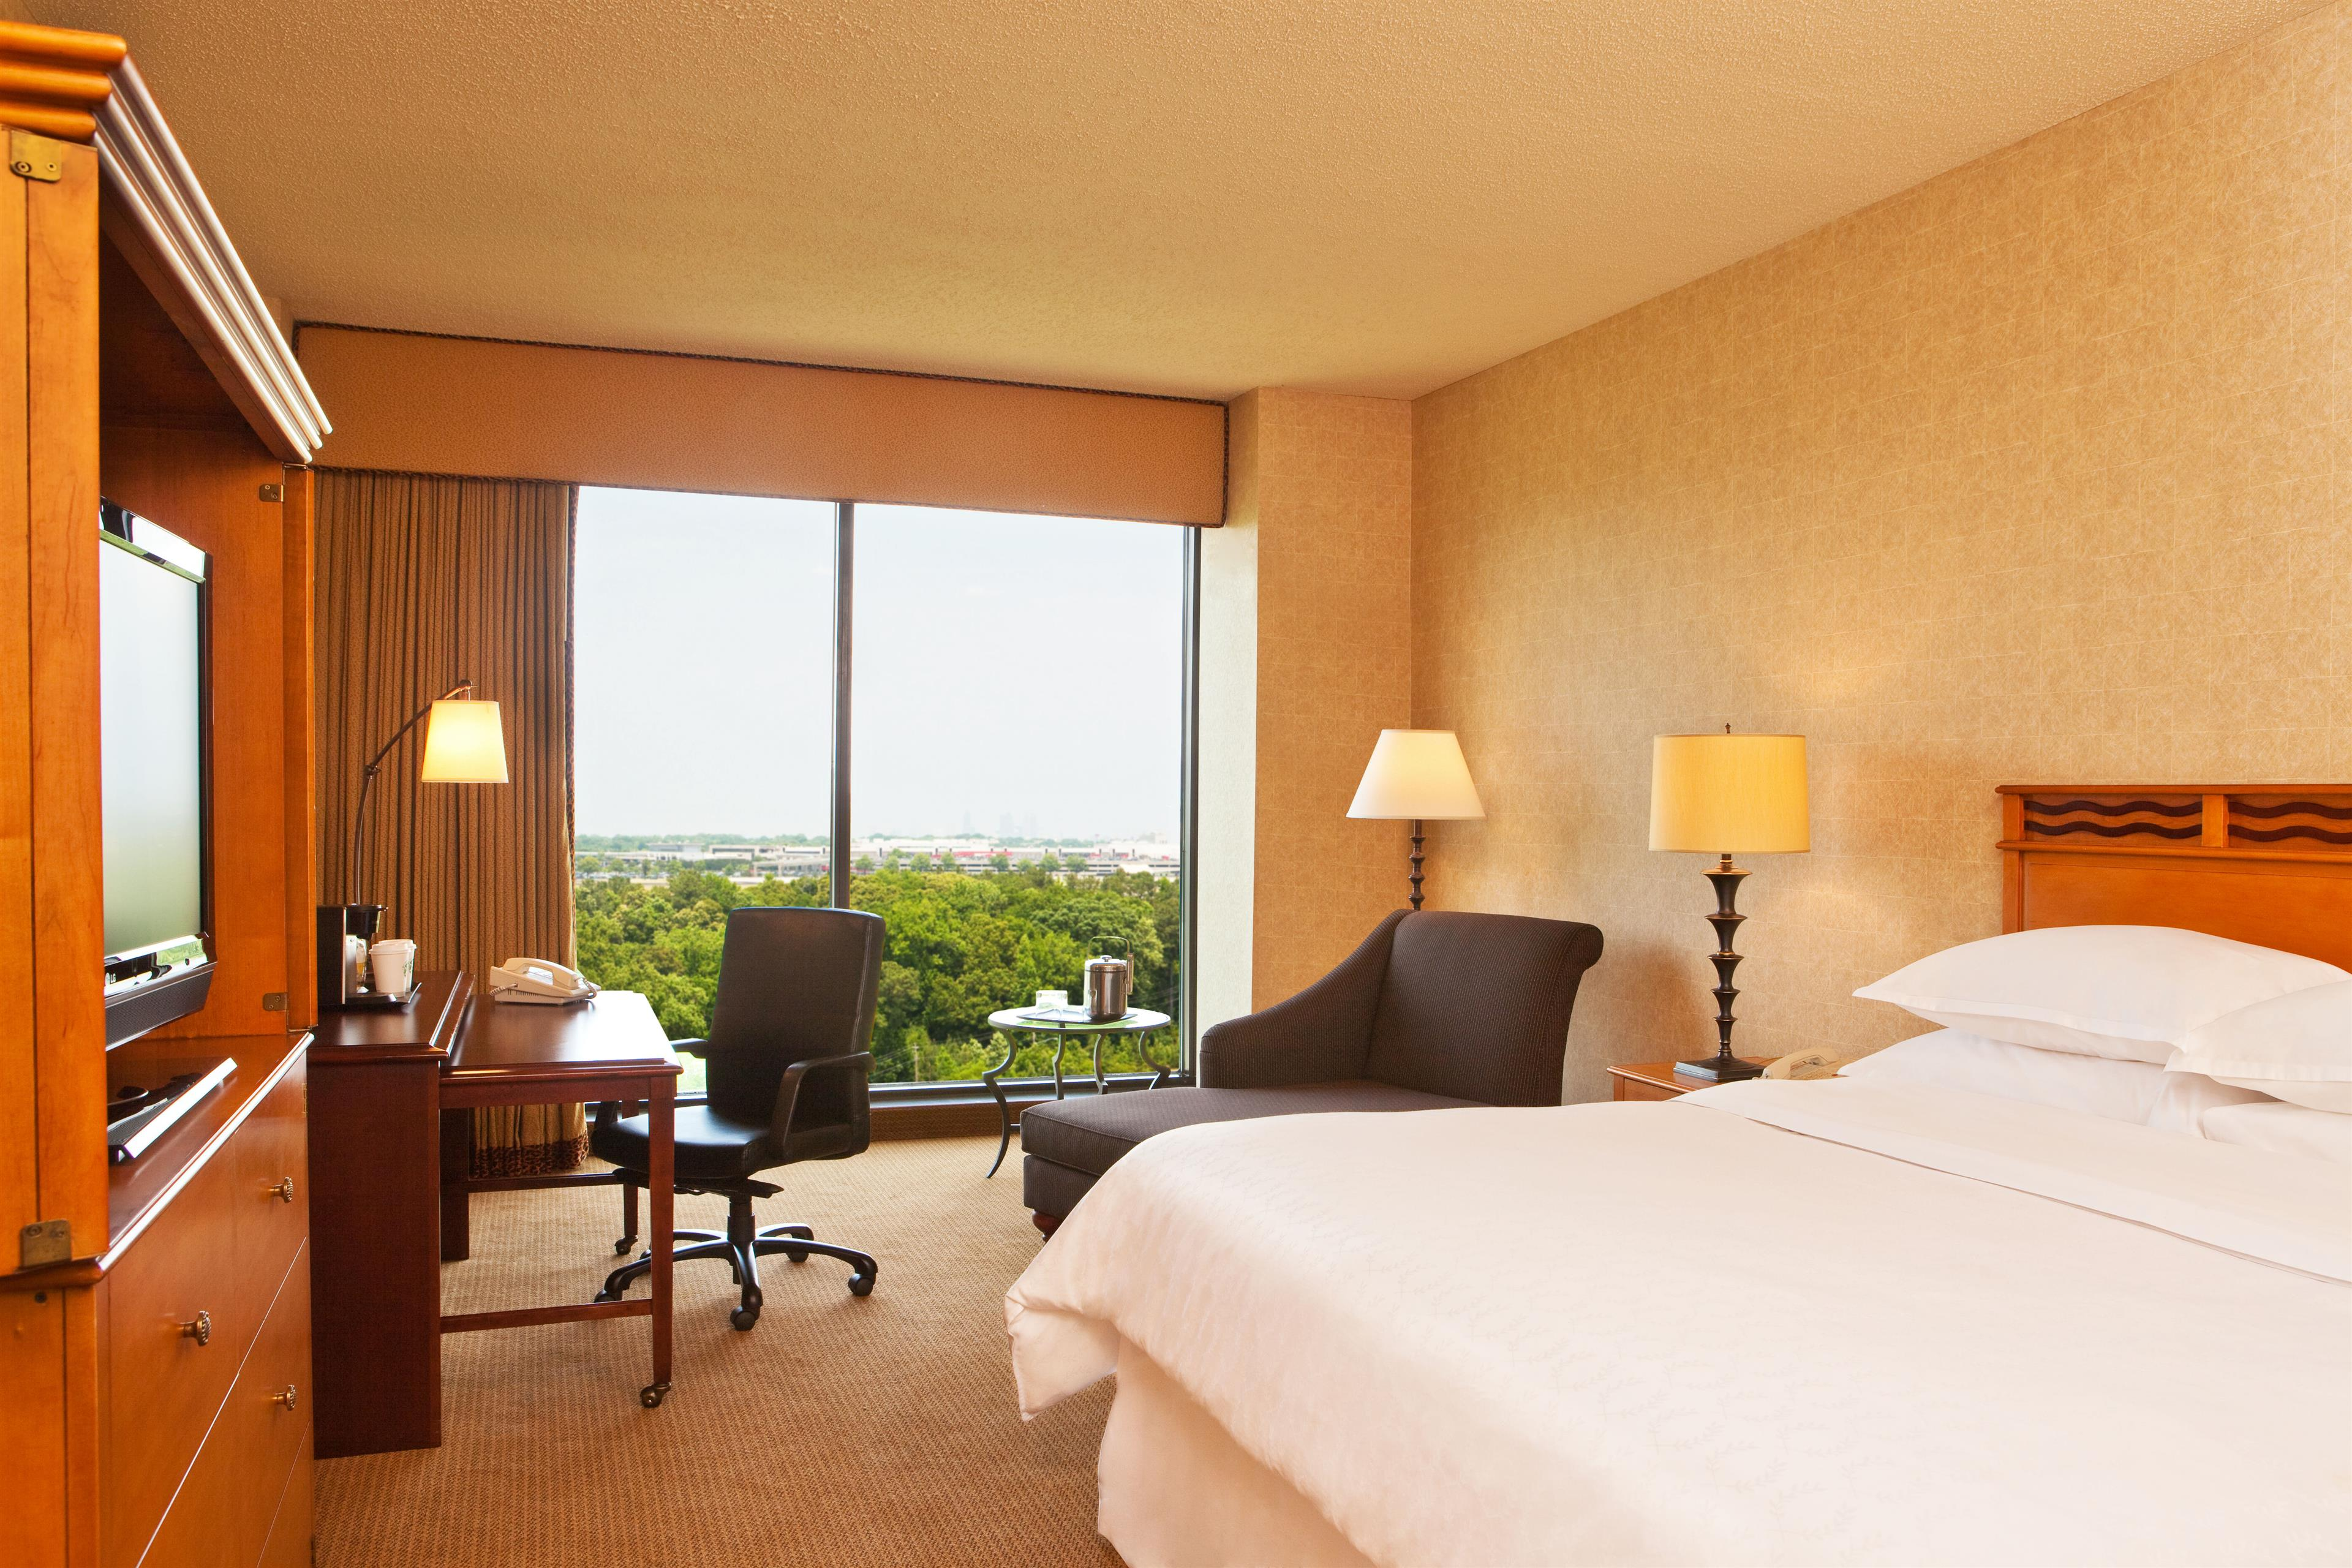 Sheraton Atlanta Airport Hotel image 6